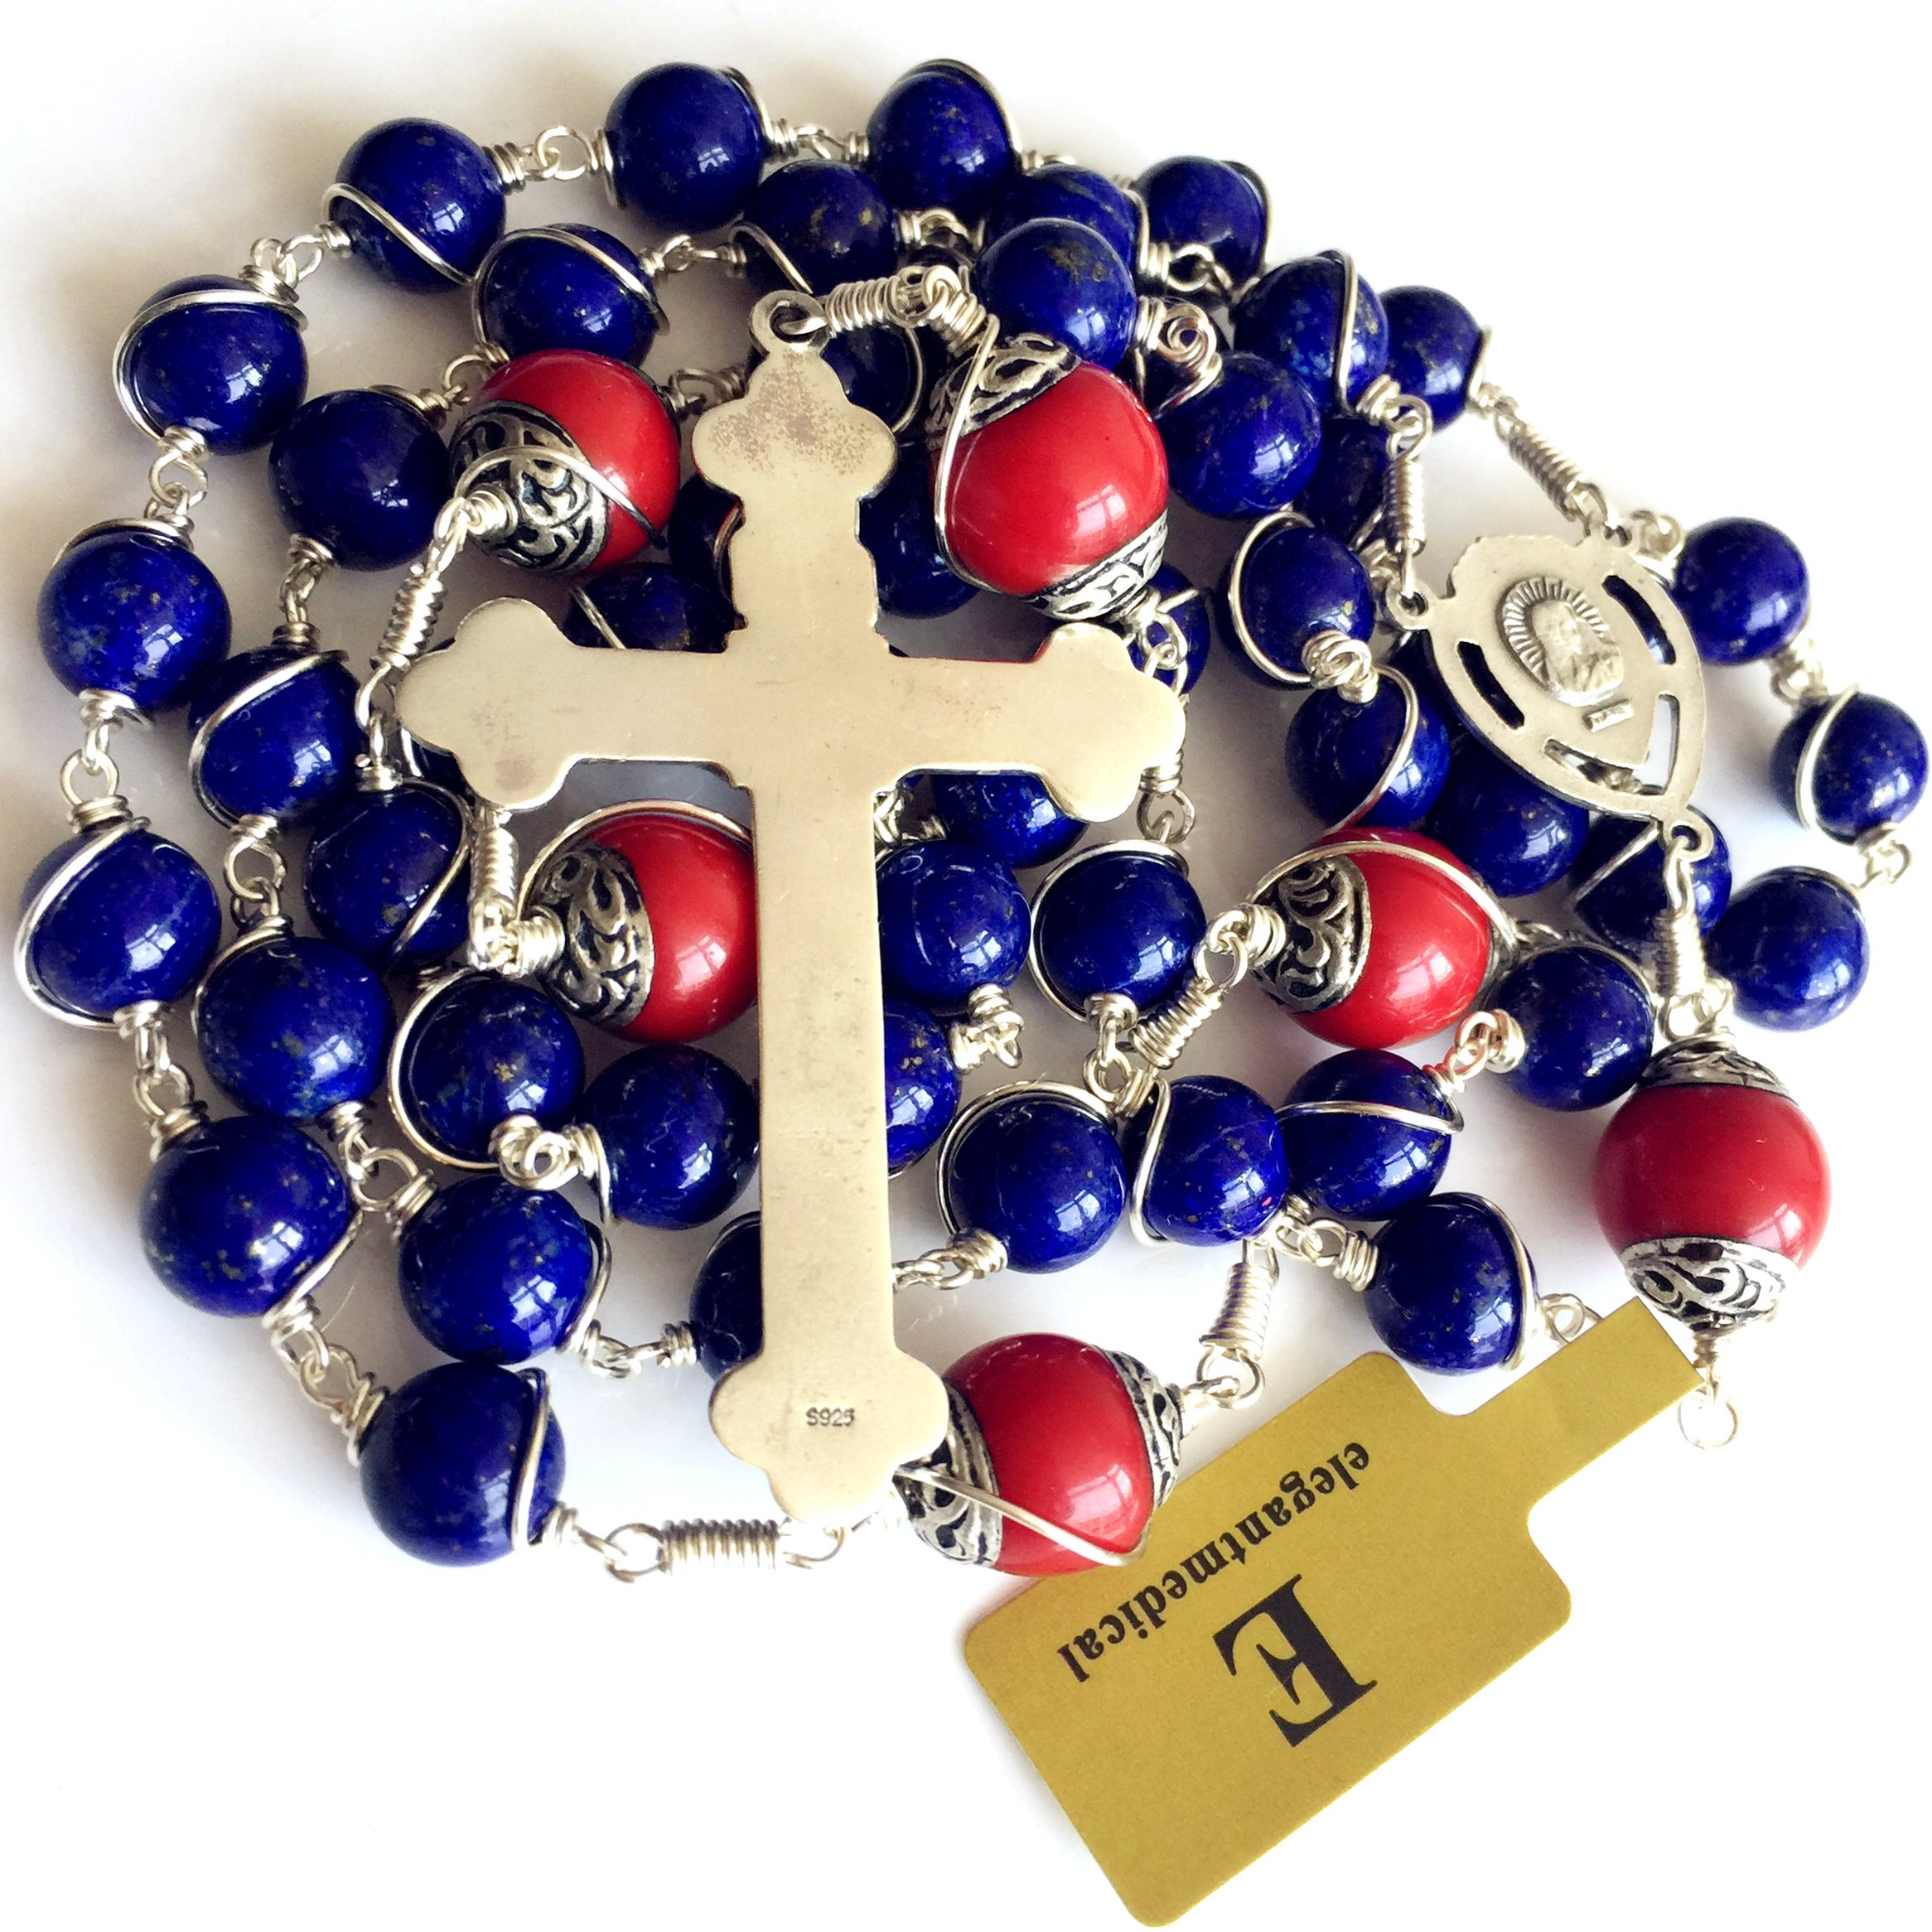 Handmade Sterling 925 Silver Lapis Lazuli Beads Rosary Cross Crucifix Catholic Necklace Gifts by elegantmedical (Image #8)